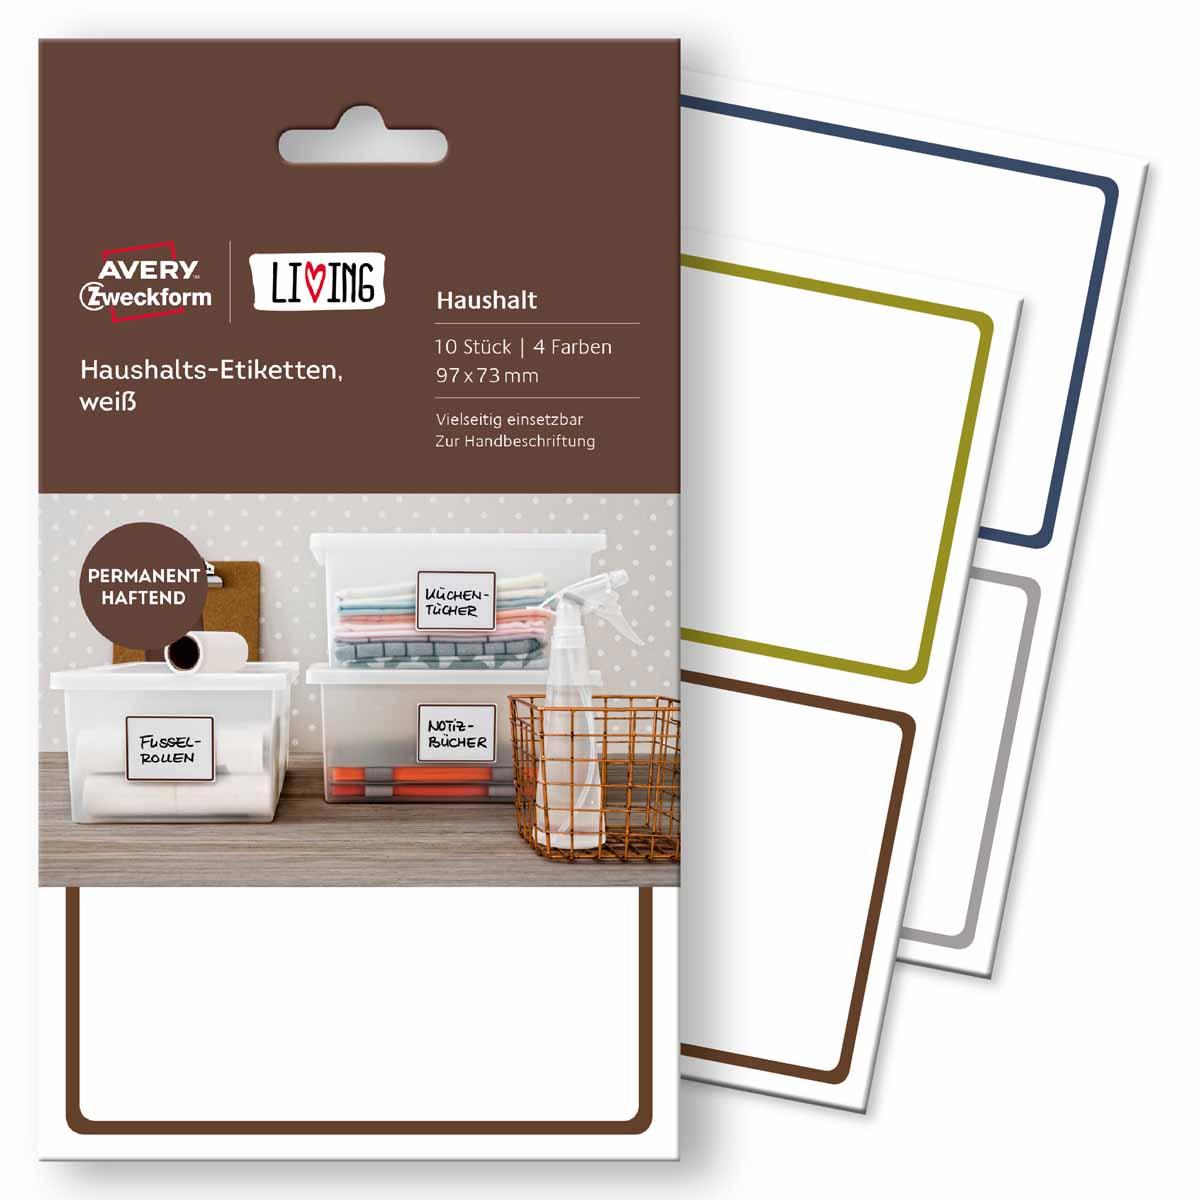 Avery Zweckform Этикетки для дома Living 97 х 73 мм avery zweckform этикетки самоклеящиеся европа 100 52 5 х 29 7 мм 18 листов